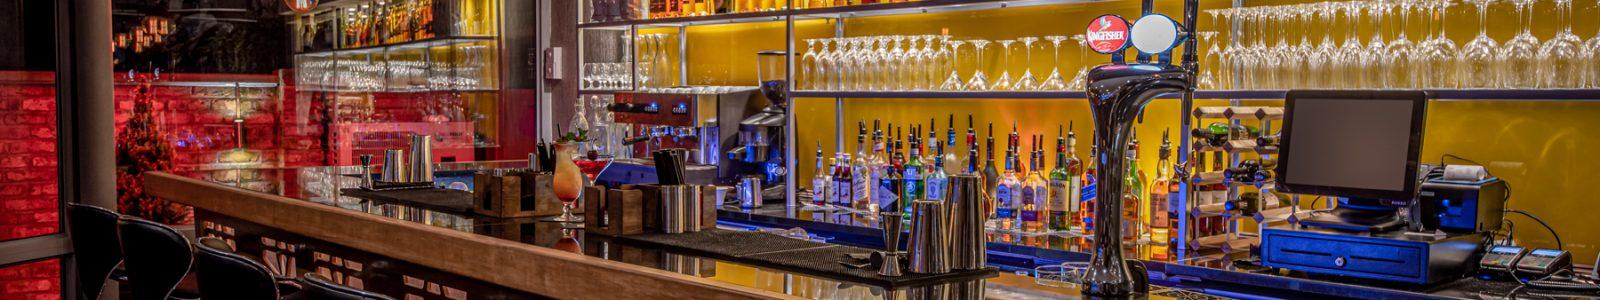 Bar & Restaurant in London